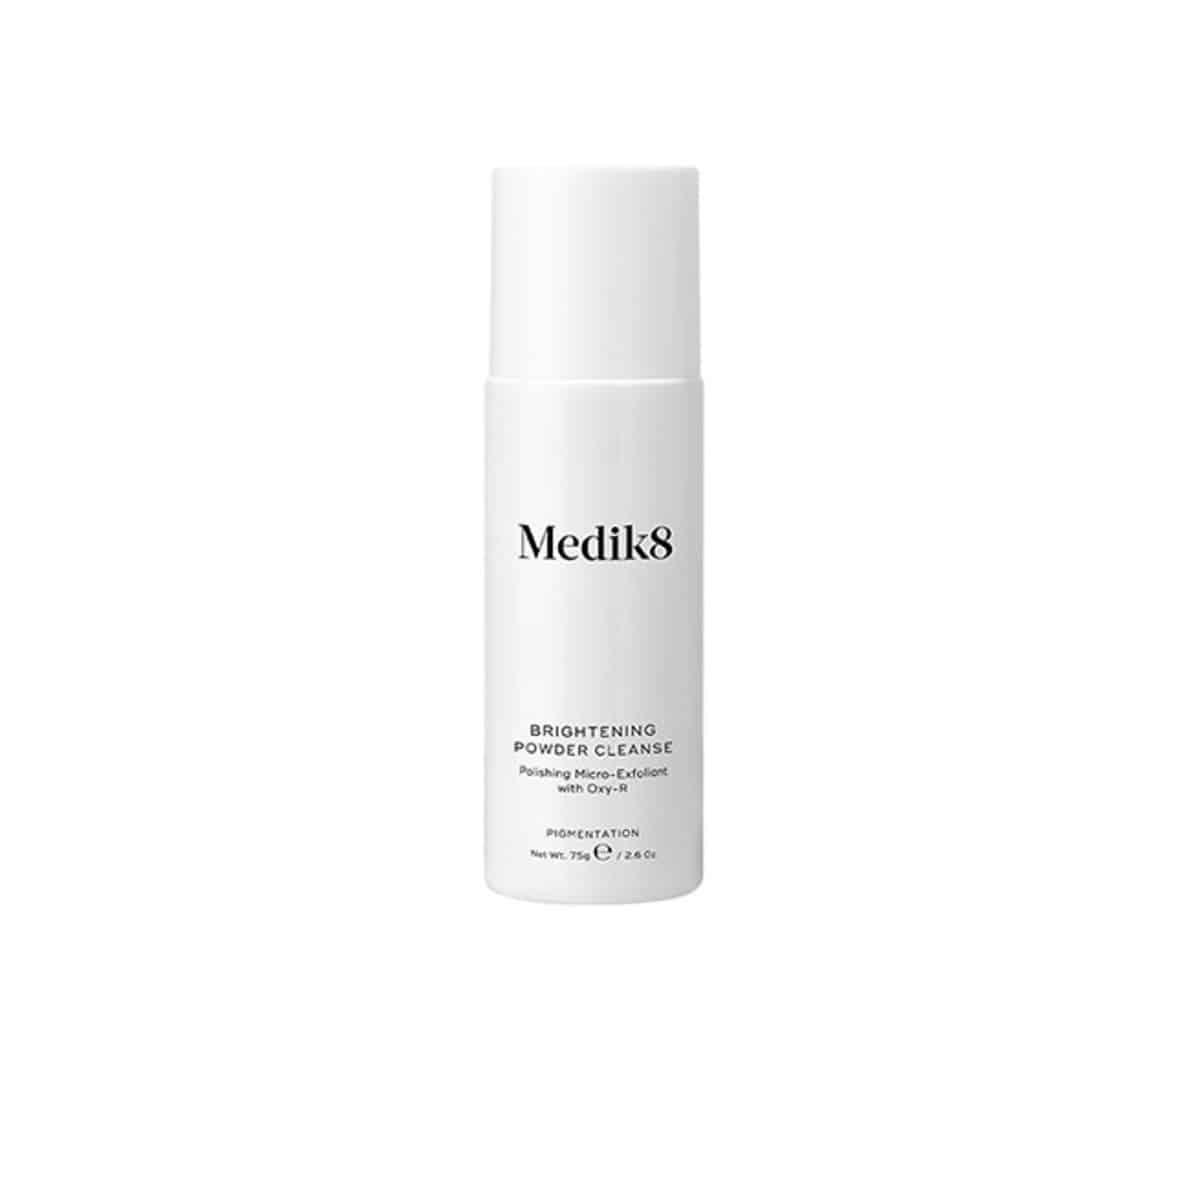 Medik8 Brightening Powder Cleanse Ireland